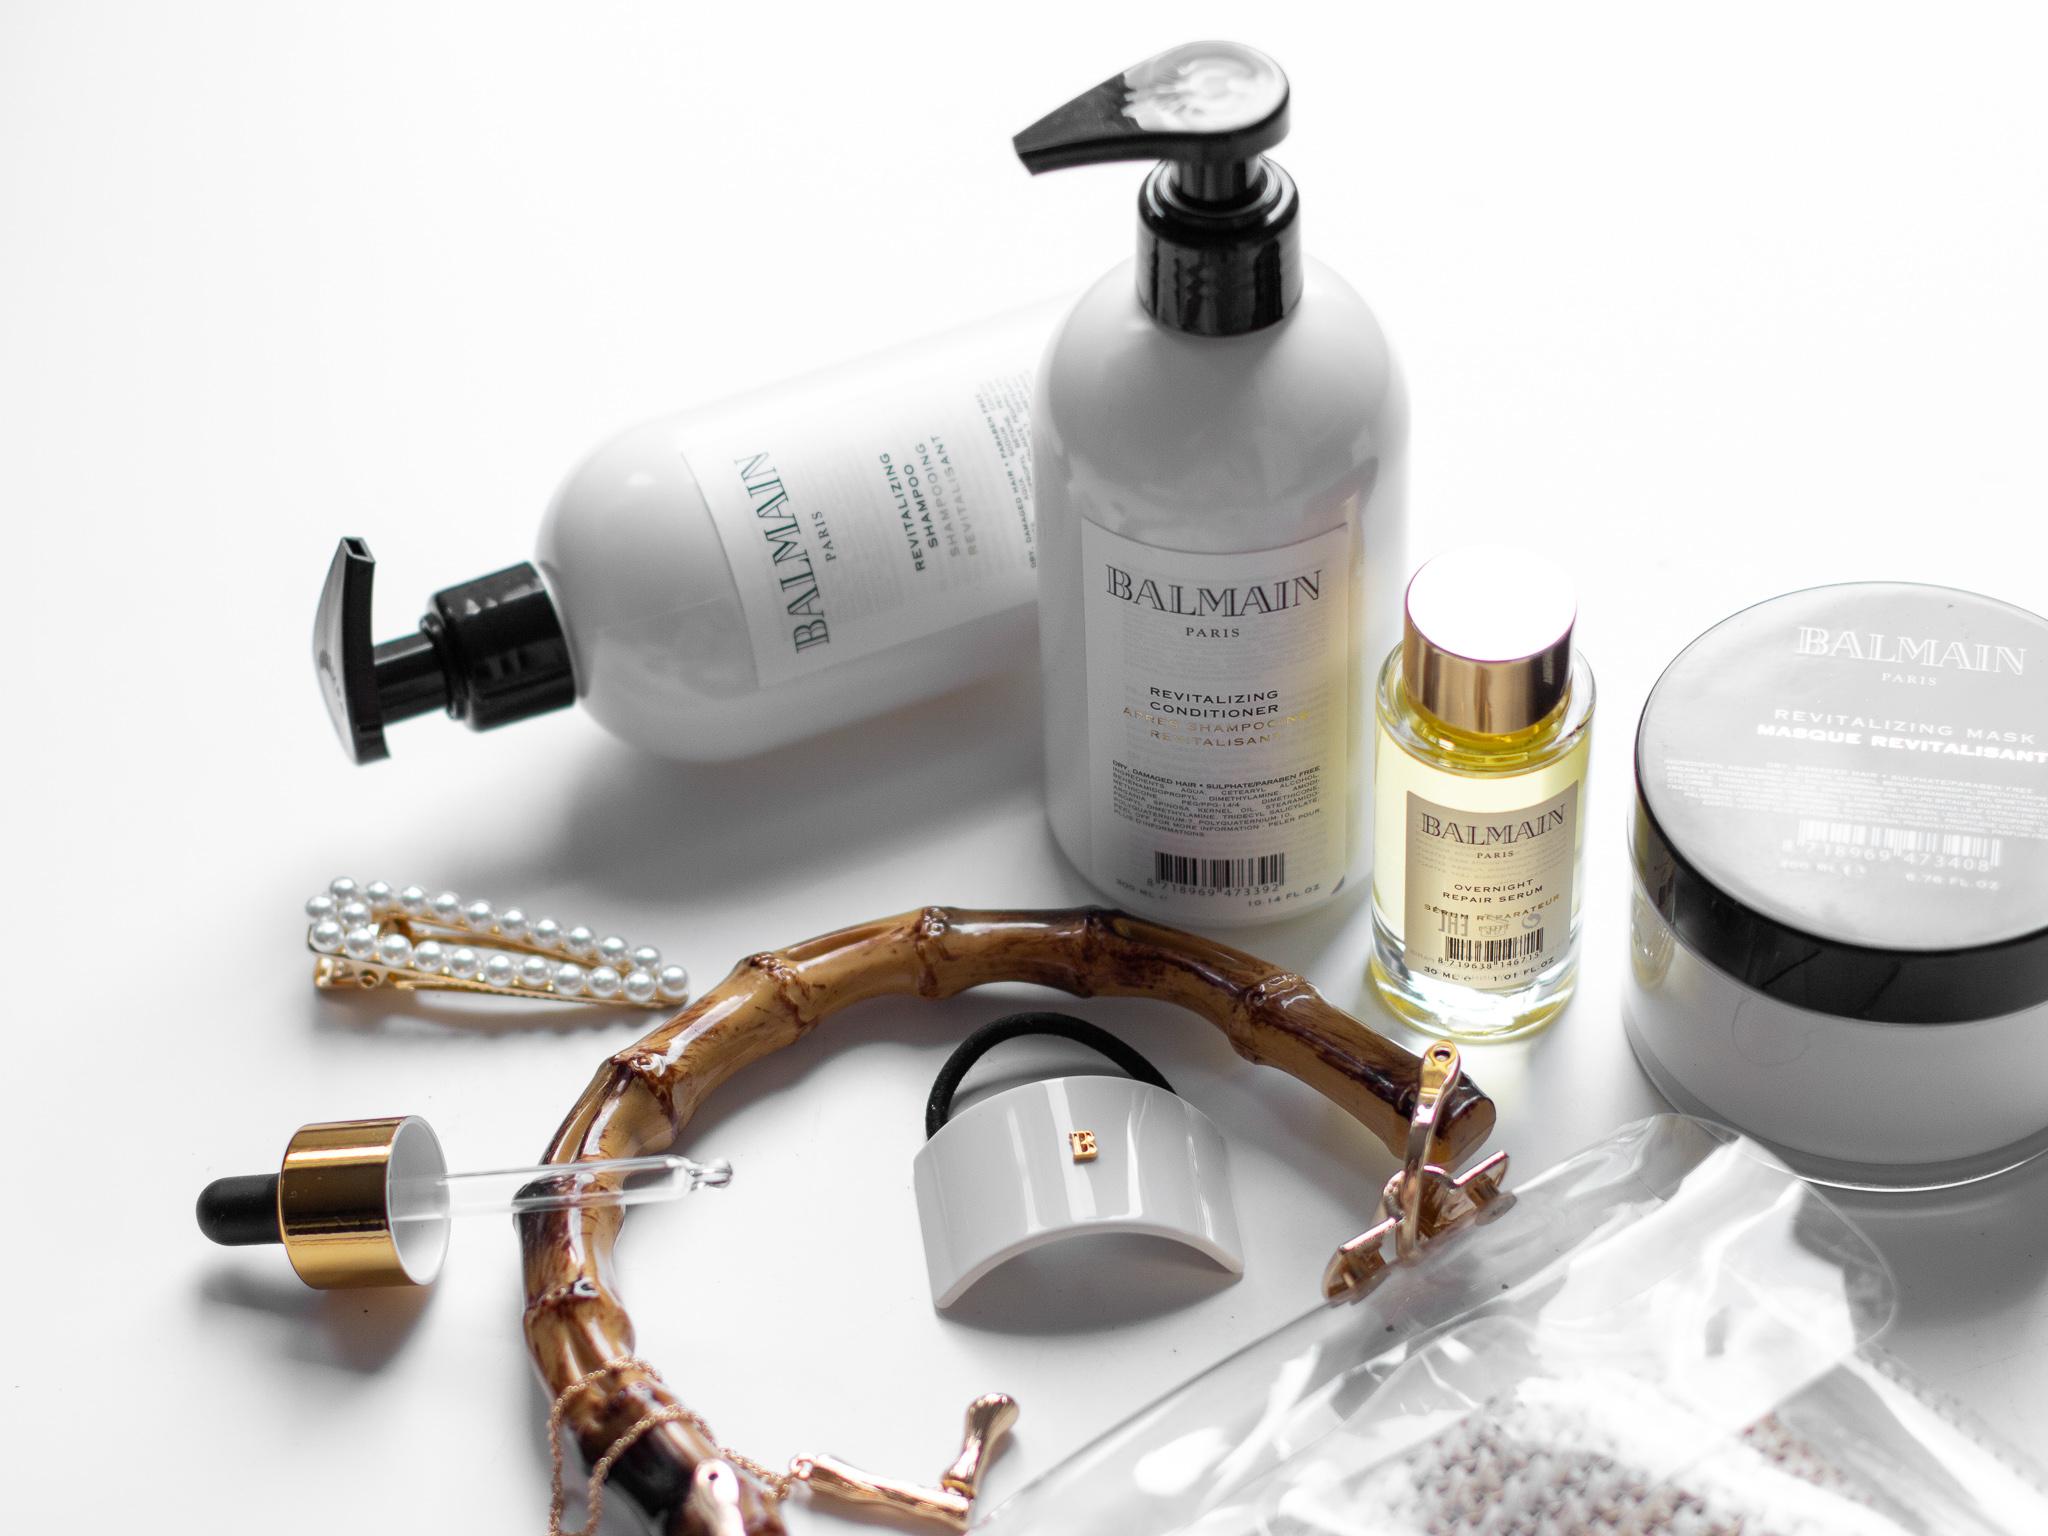 balmain revitalizing šampon a kondicionér